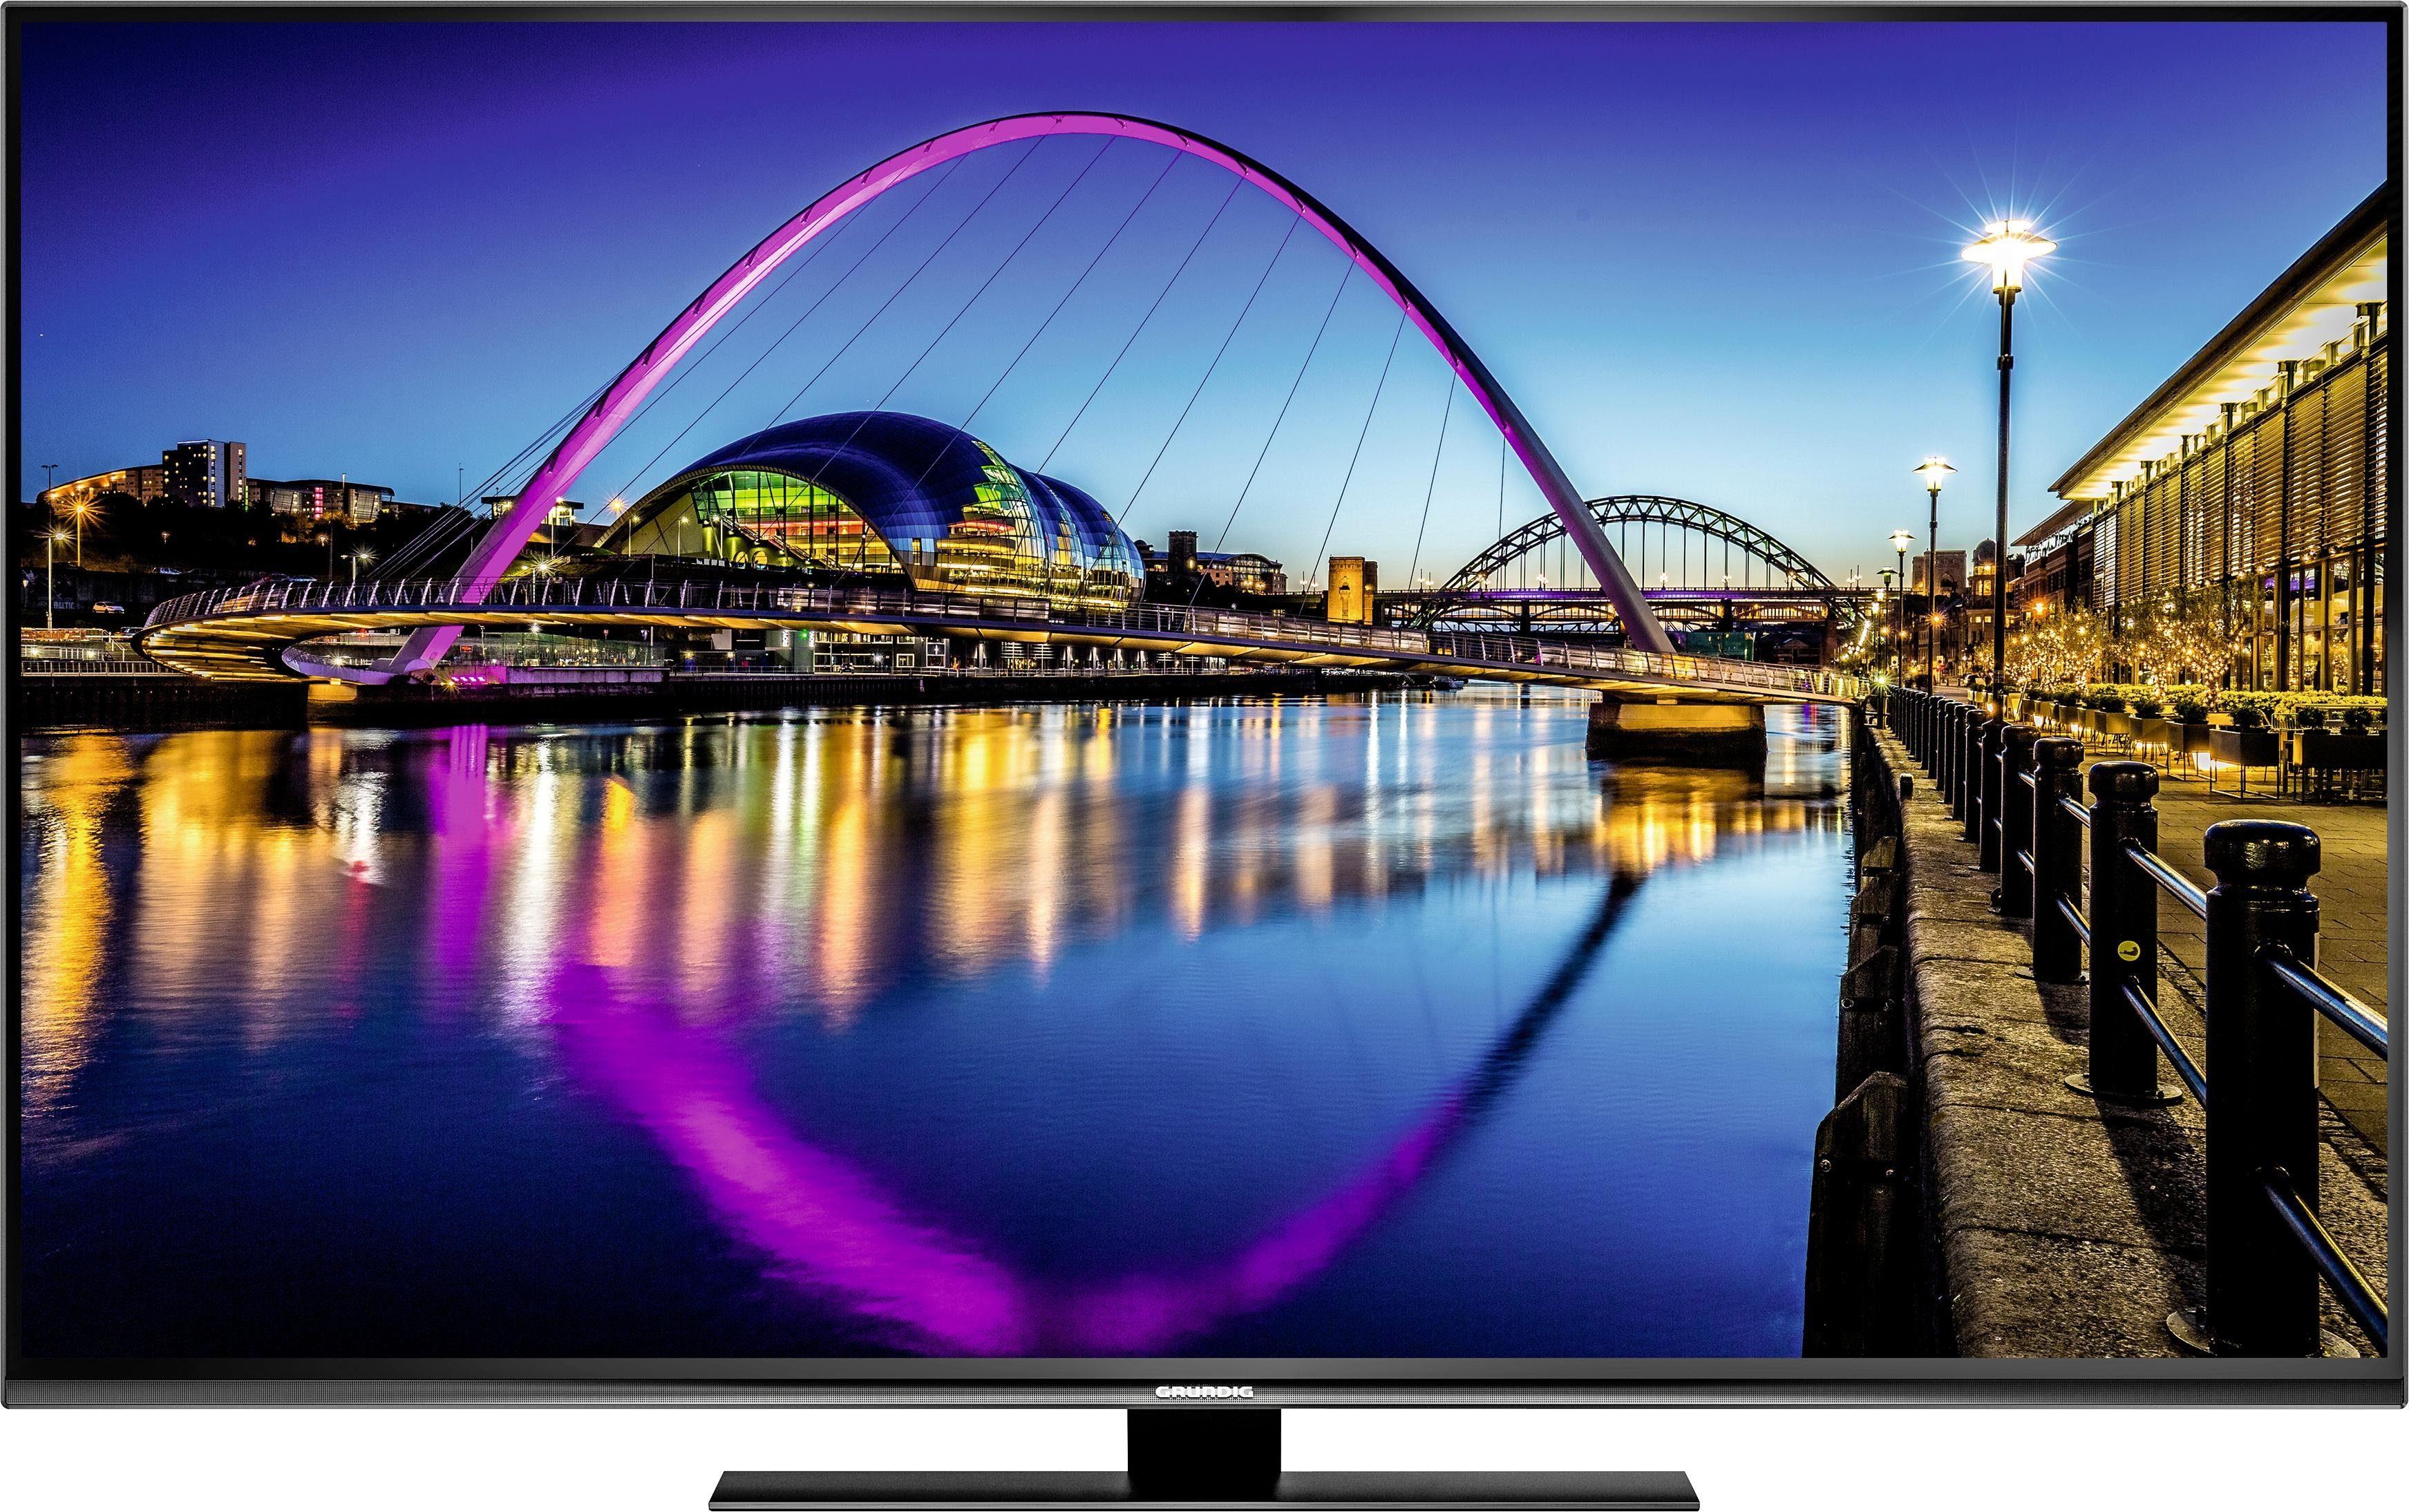 Grundig 49 GUB 9890 LED-Fernseher (123 cm/49 Zoll, 4K Ultra HD, Smart-TV)